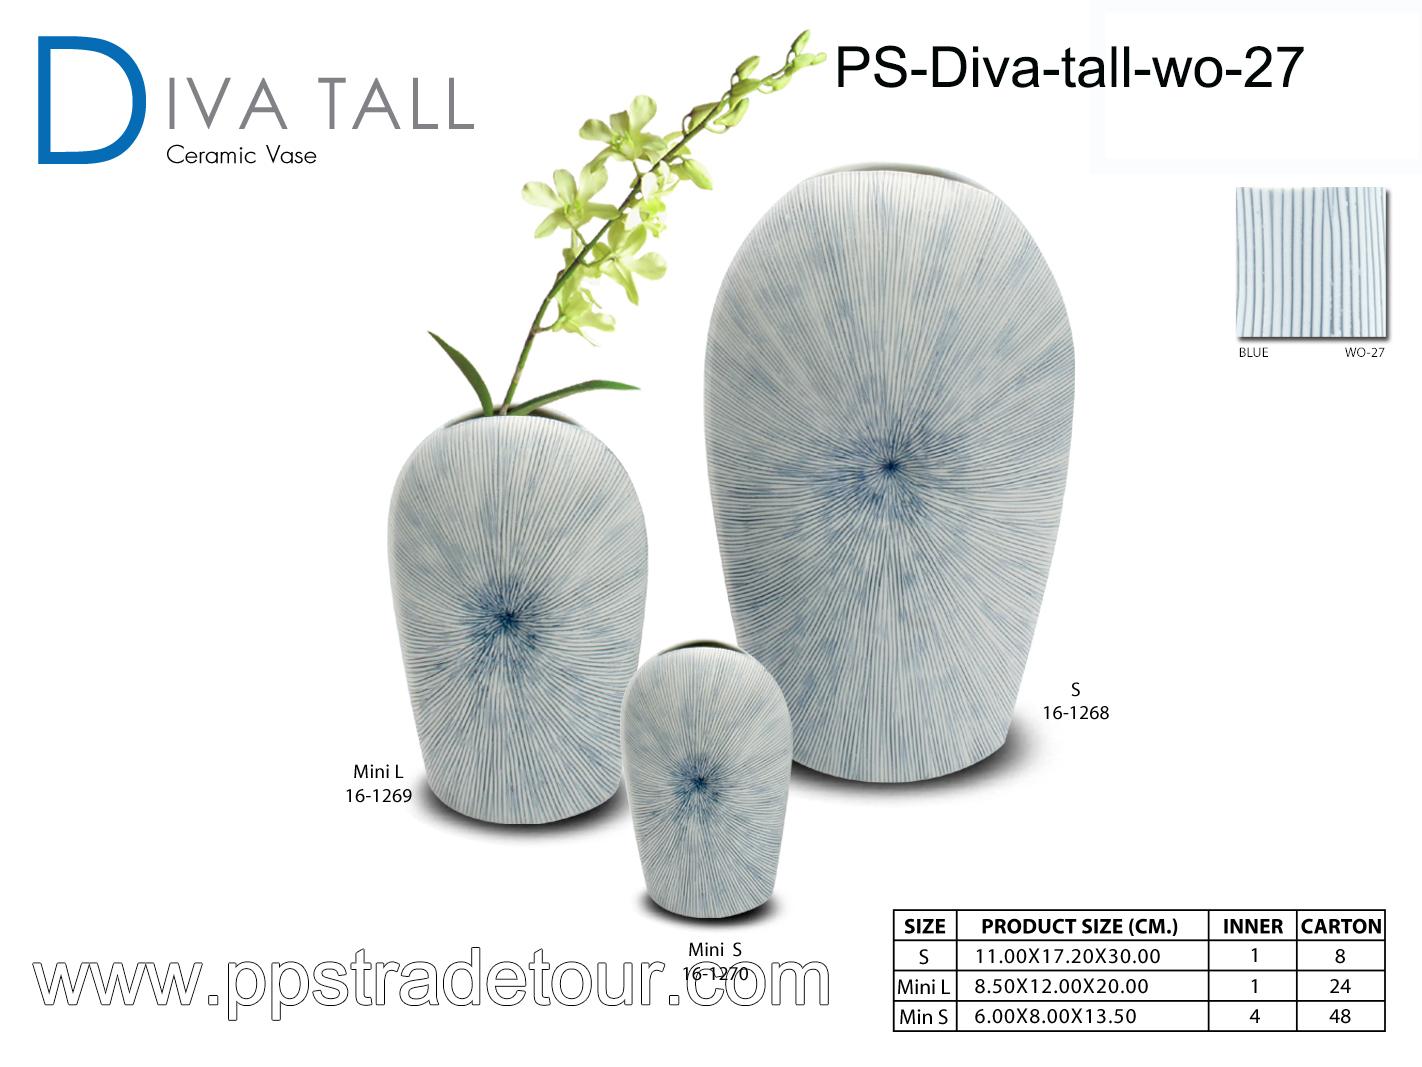 PSCV-Diva-Tall_wo-27